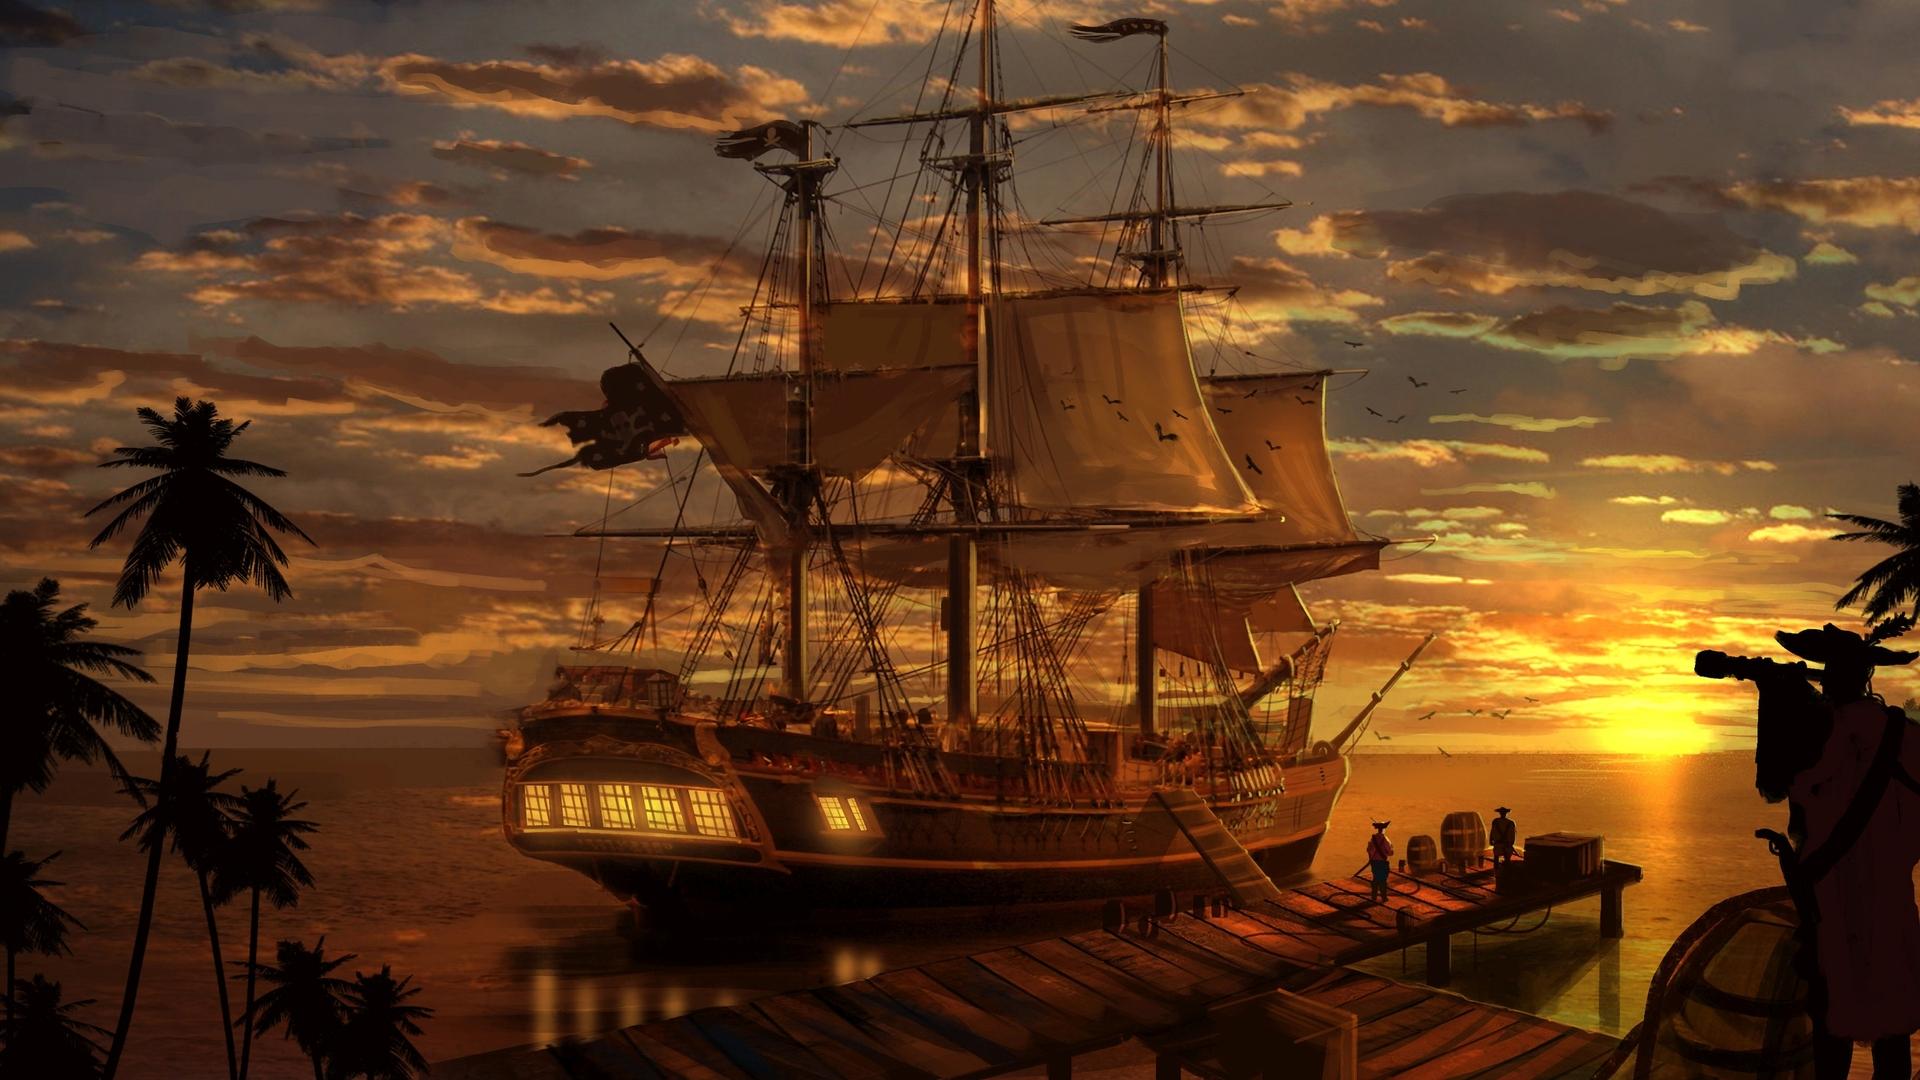 Vehicle_Pirate_ship.jpg